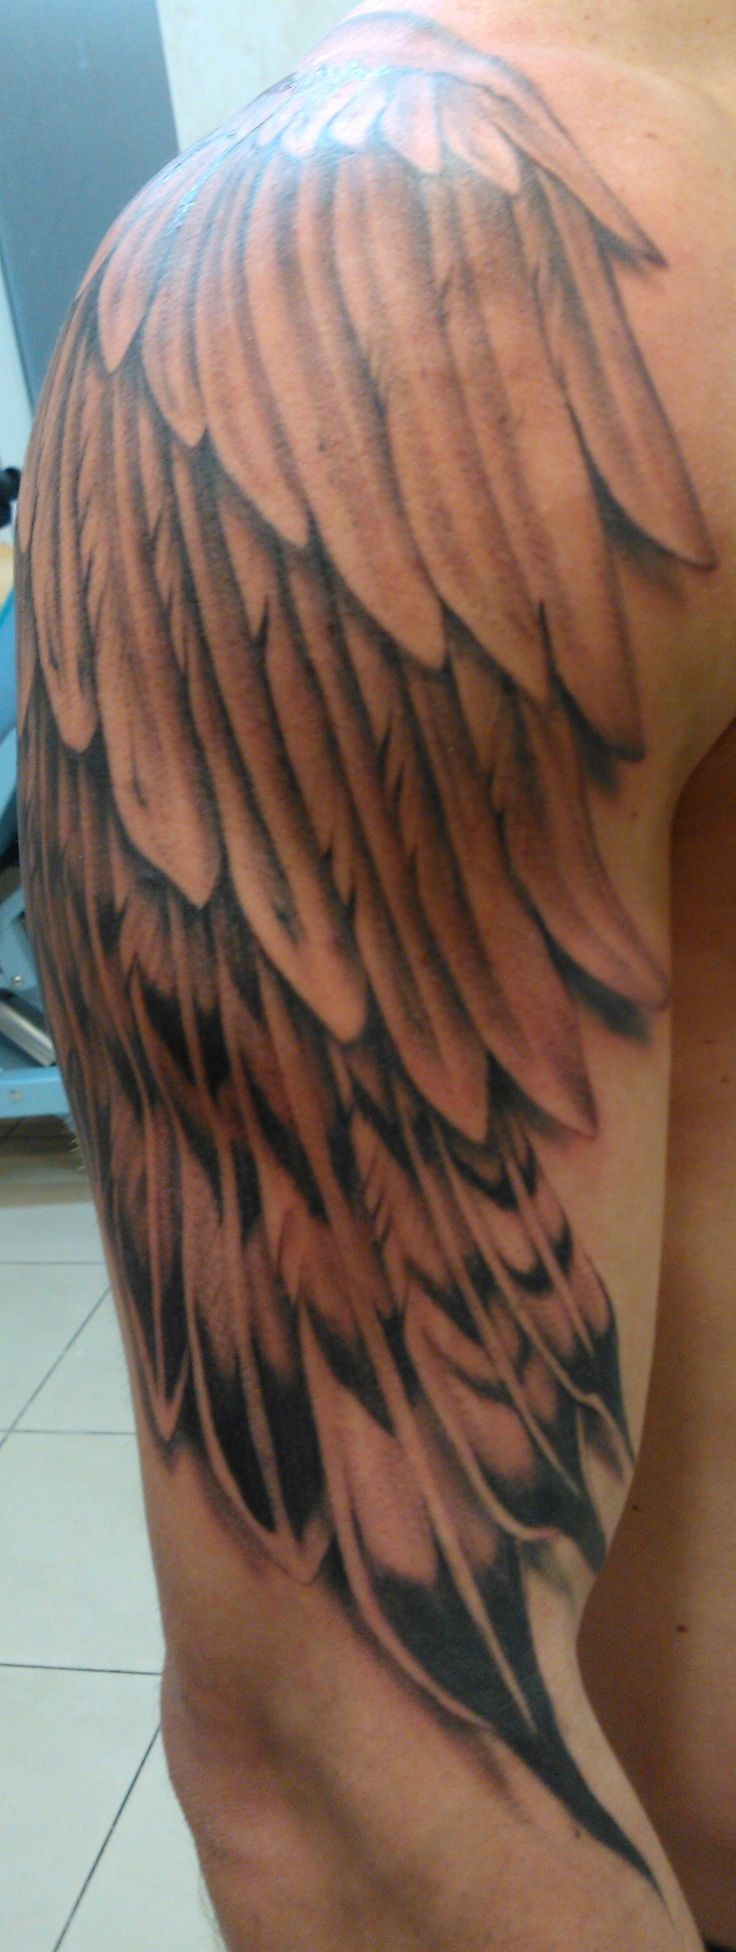 Tatouage ailes d ange dos femme fashion designs - Tatouage aile d ange homme ...